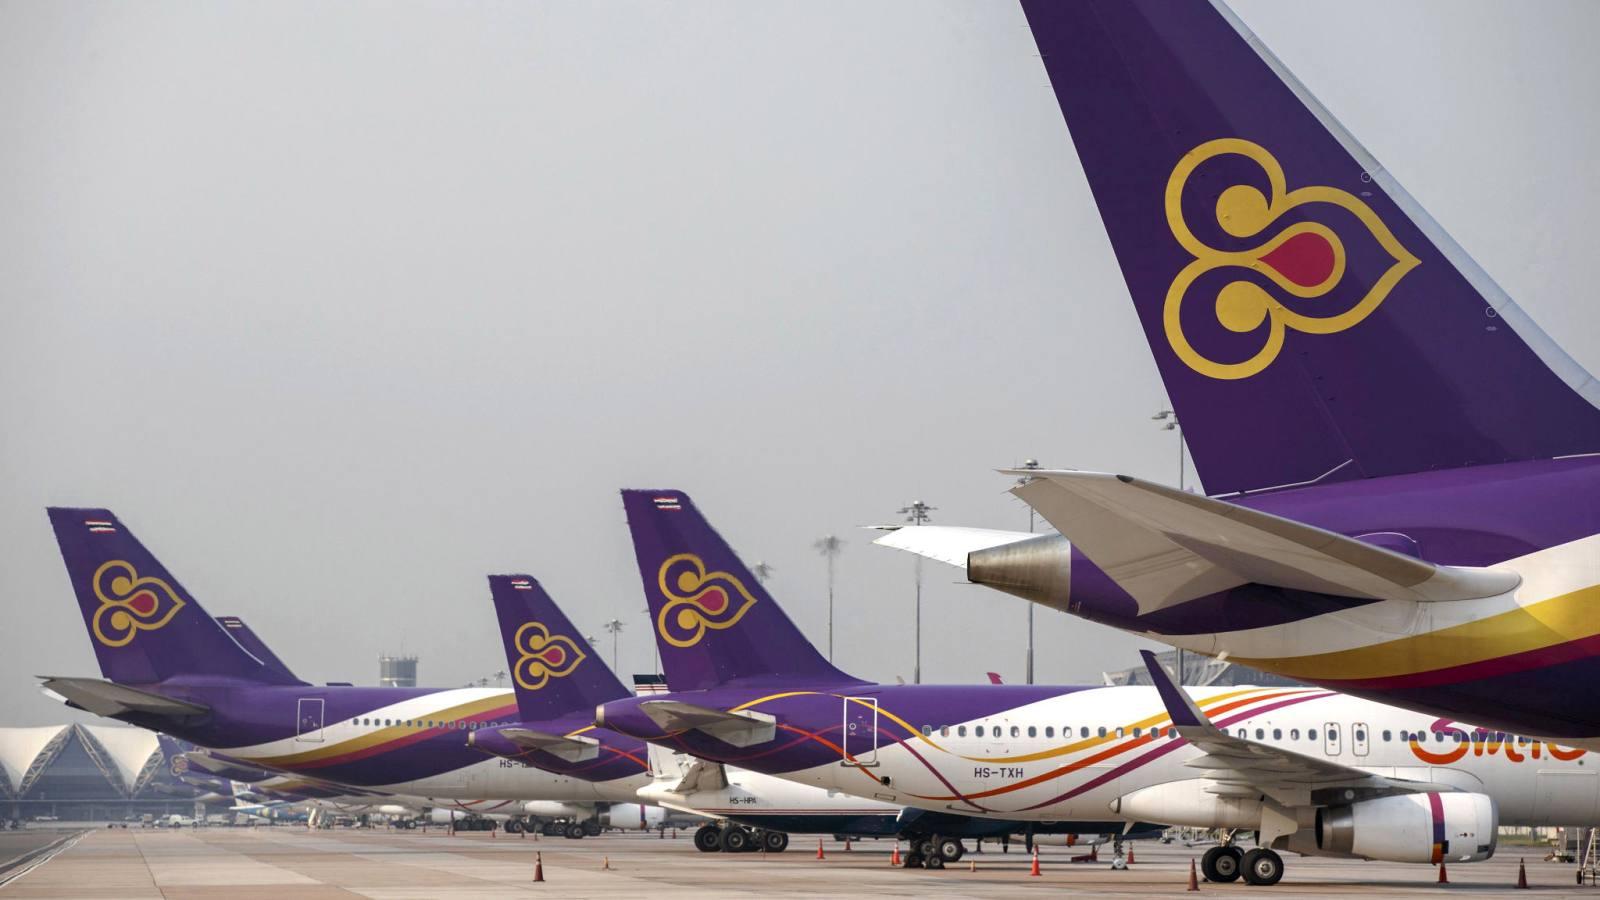 Thai Airways aircraft are parked on the tarmac at Bangkok's Suvarnabhumi International Airport.